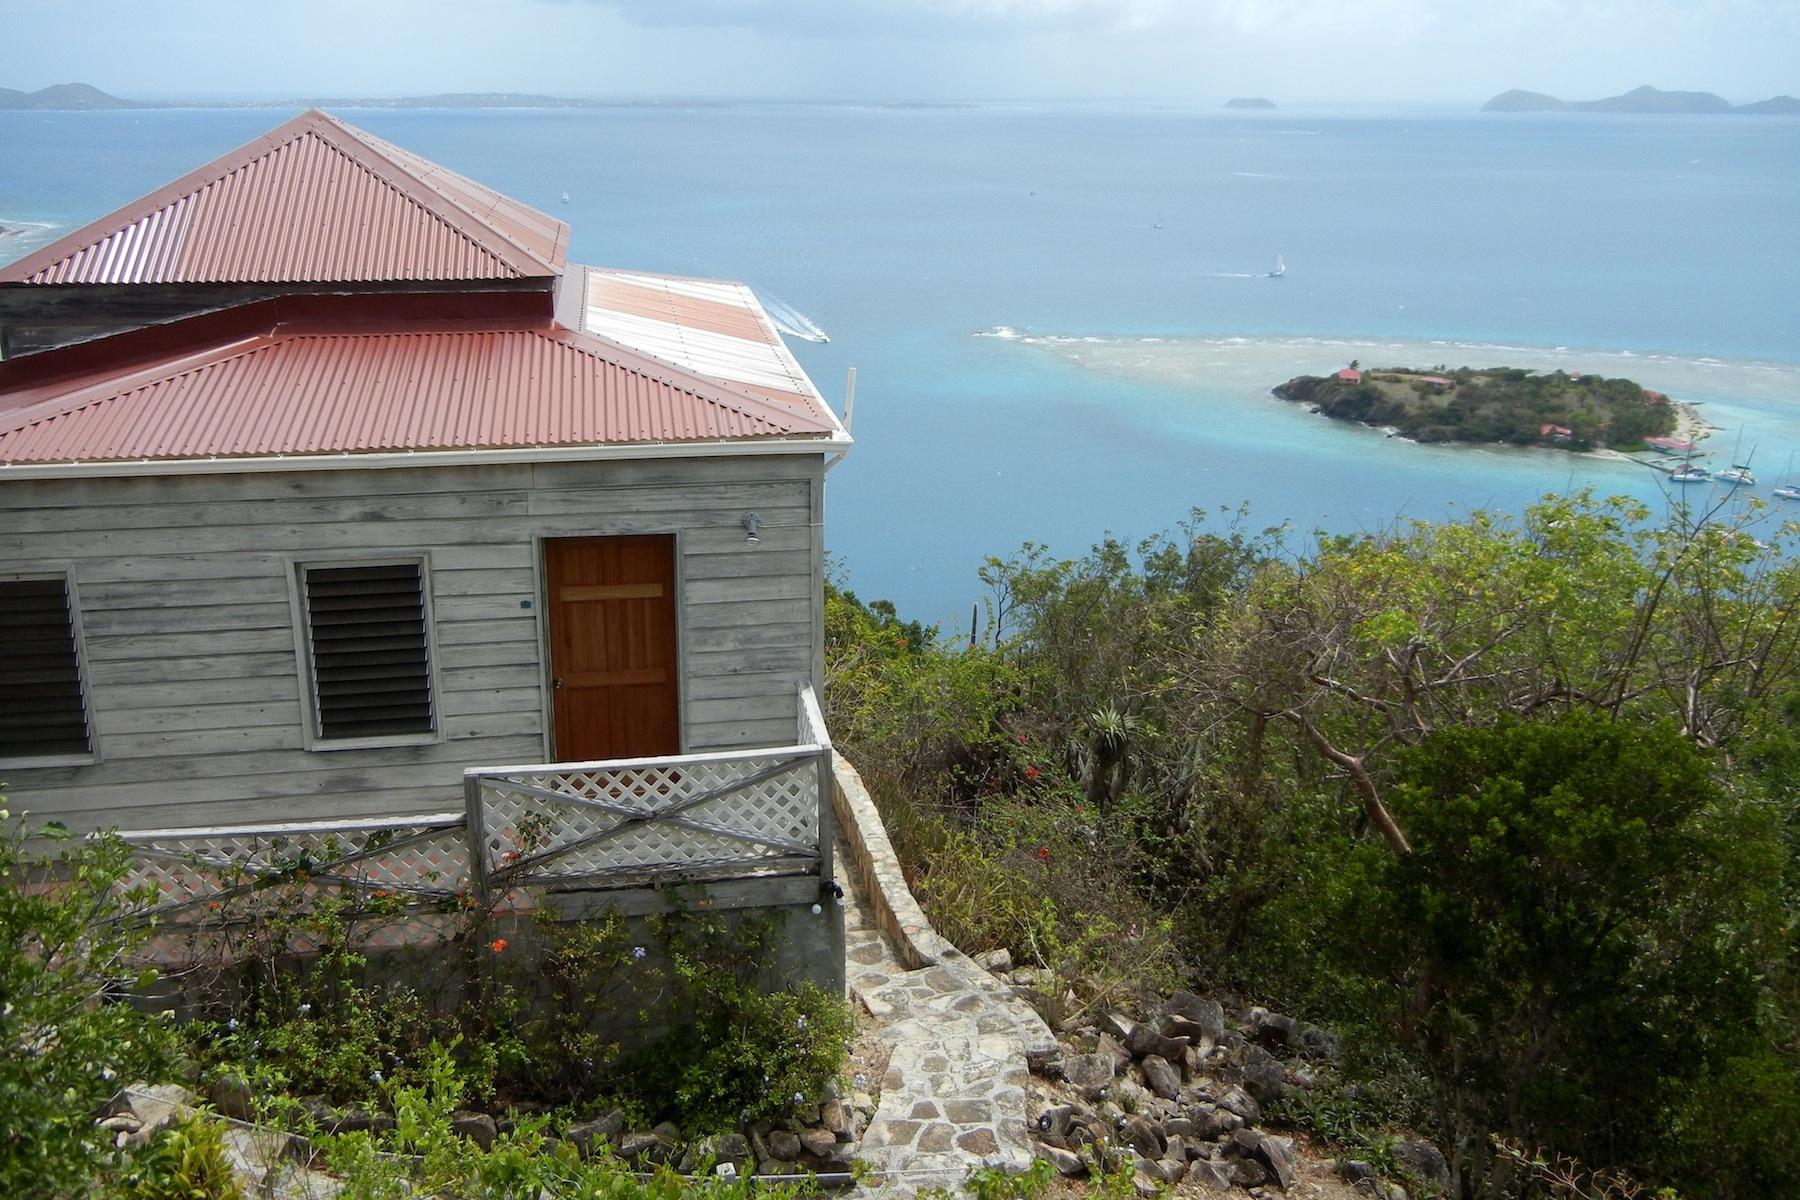 Villa per Vendita alle ore Prospect Other Great Camanoe, Great Camanoe Isole Vergini Britanniche